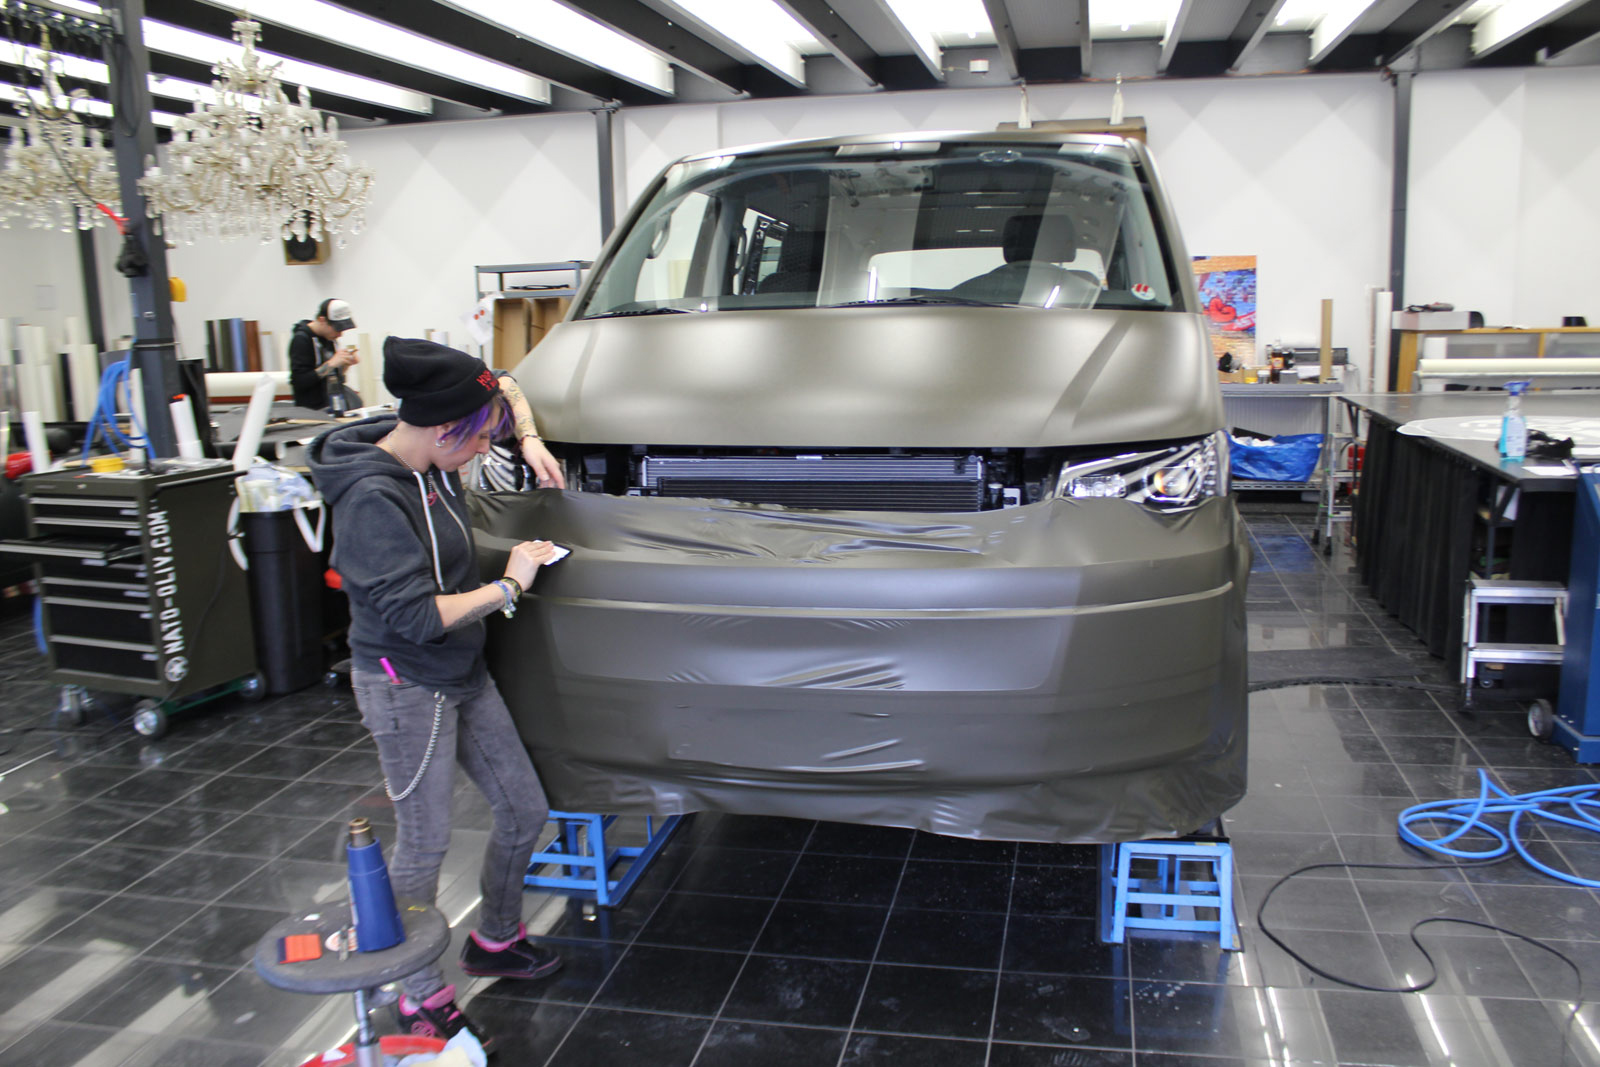 VW_T5_VOLLFOLIERUNG_NATO-OLIV_04